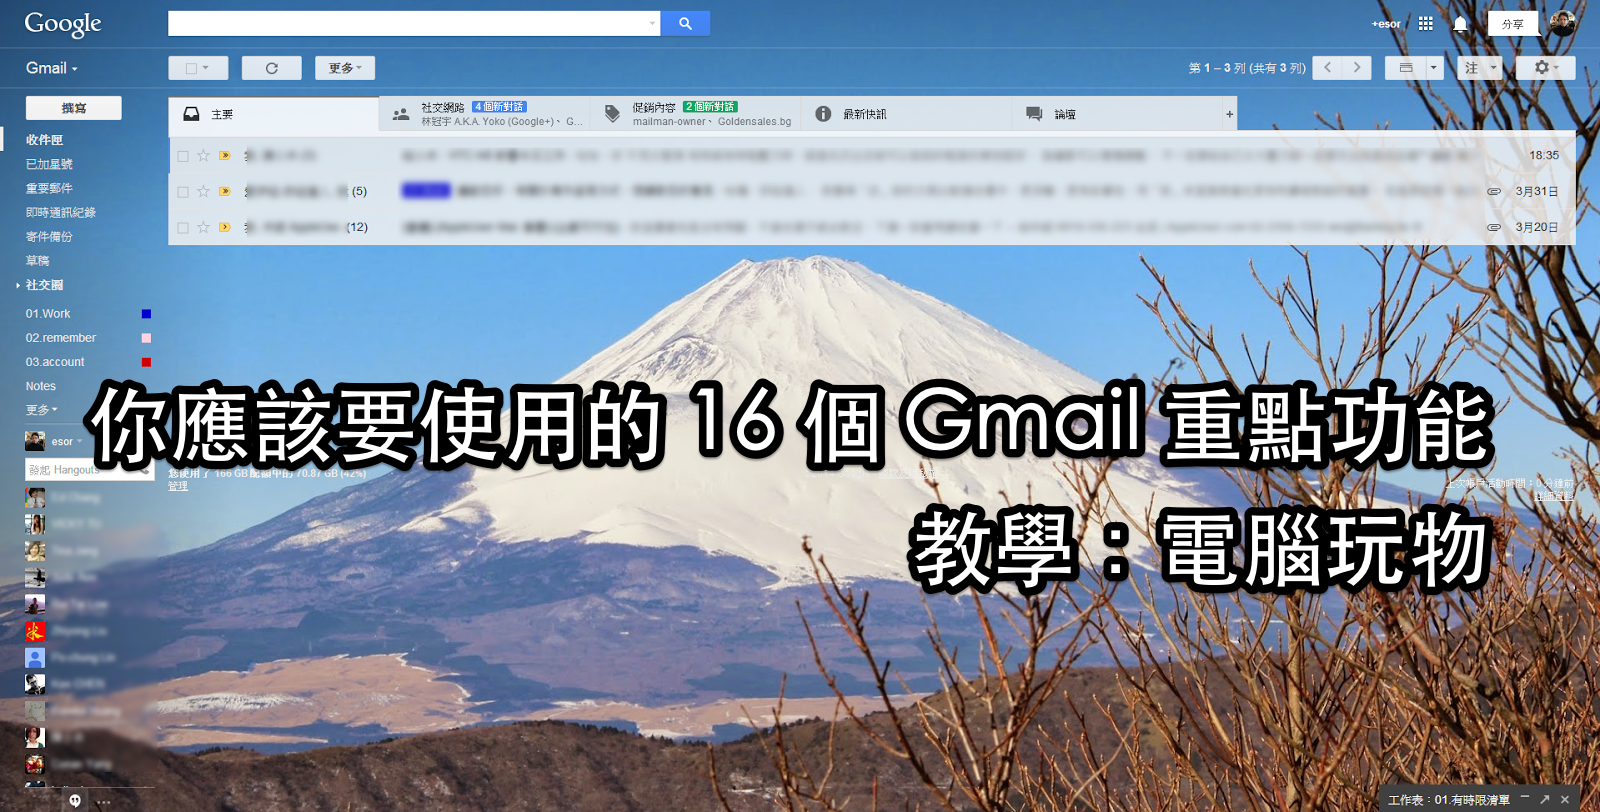 Gmail mountain theme images - Gmail Mountain Theme Images 9